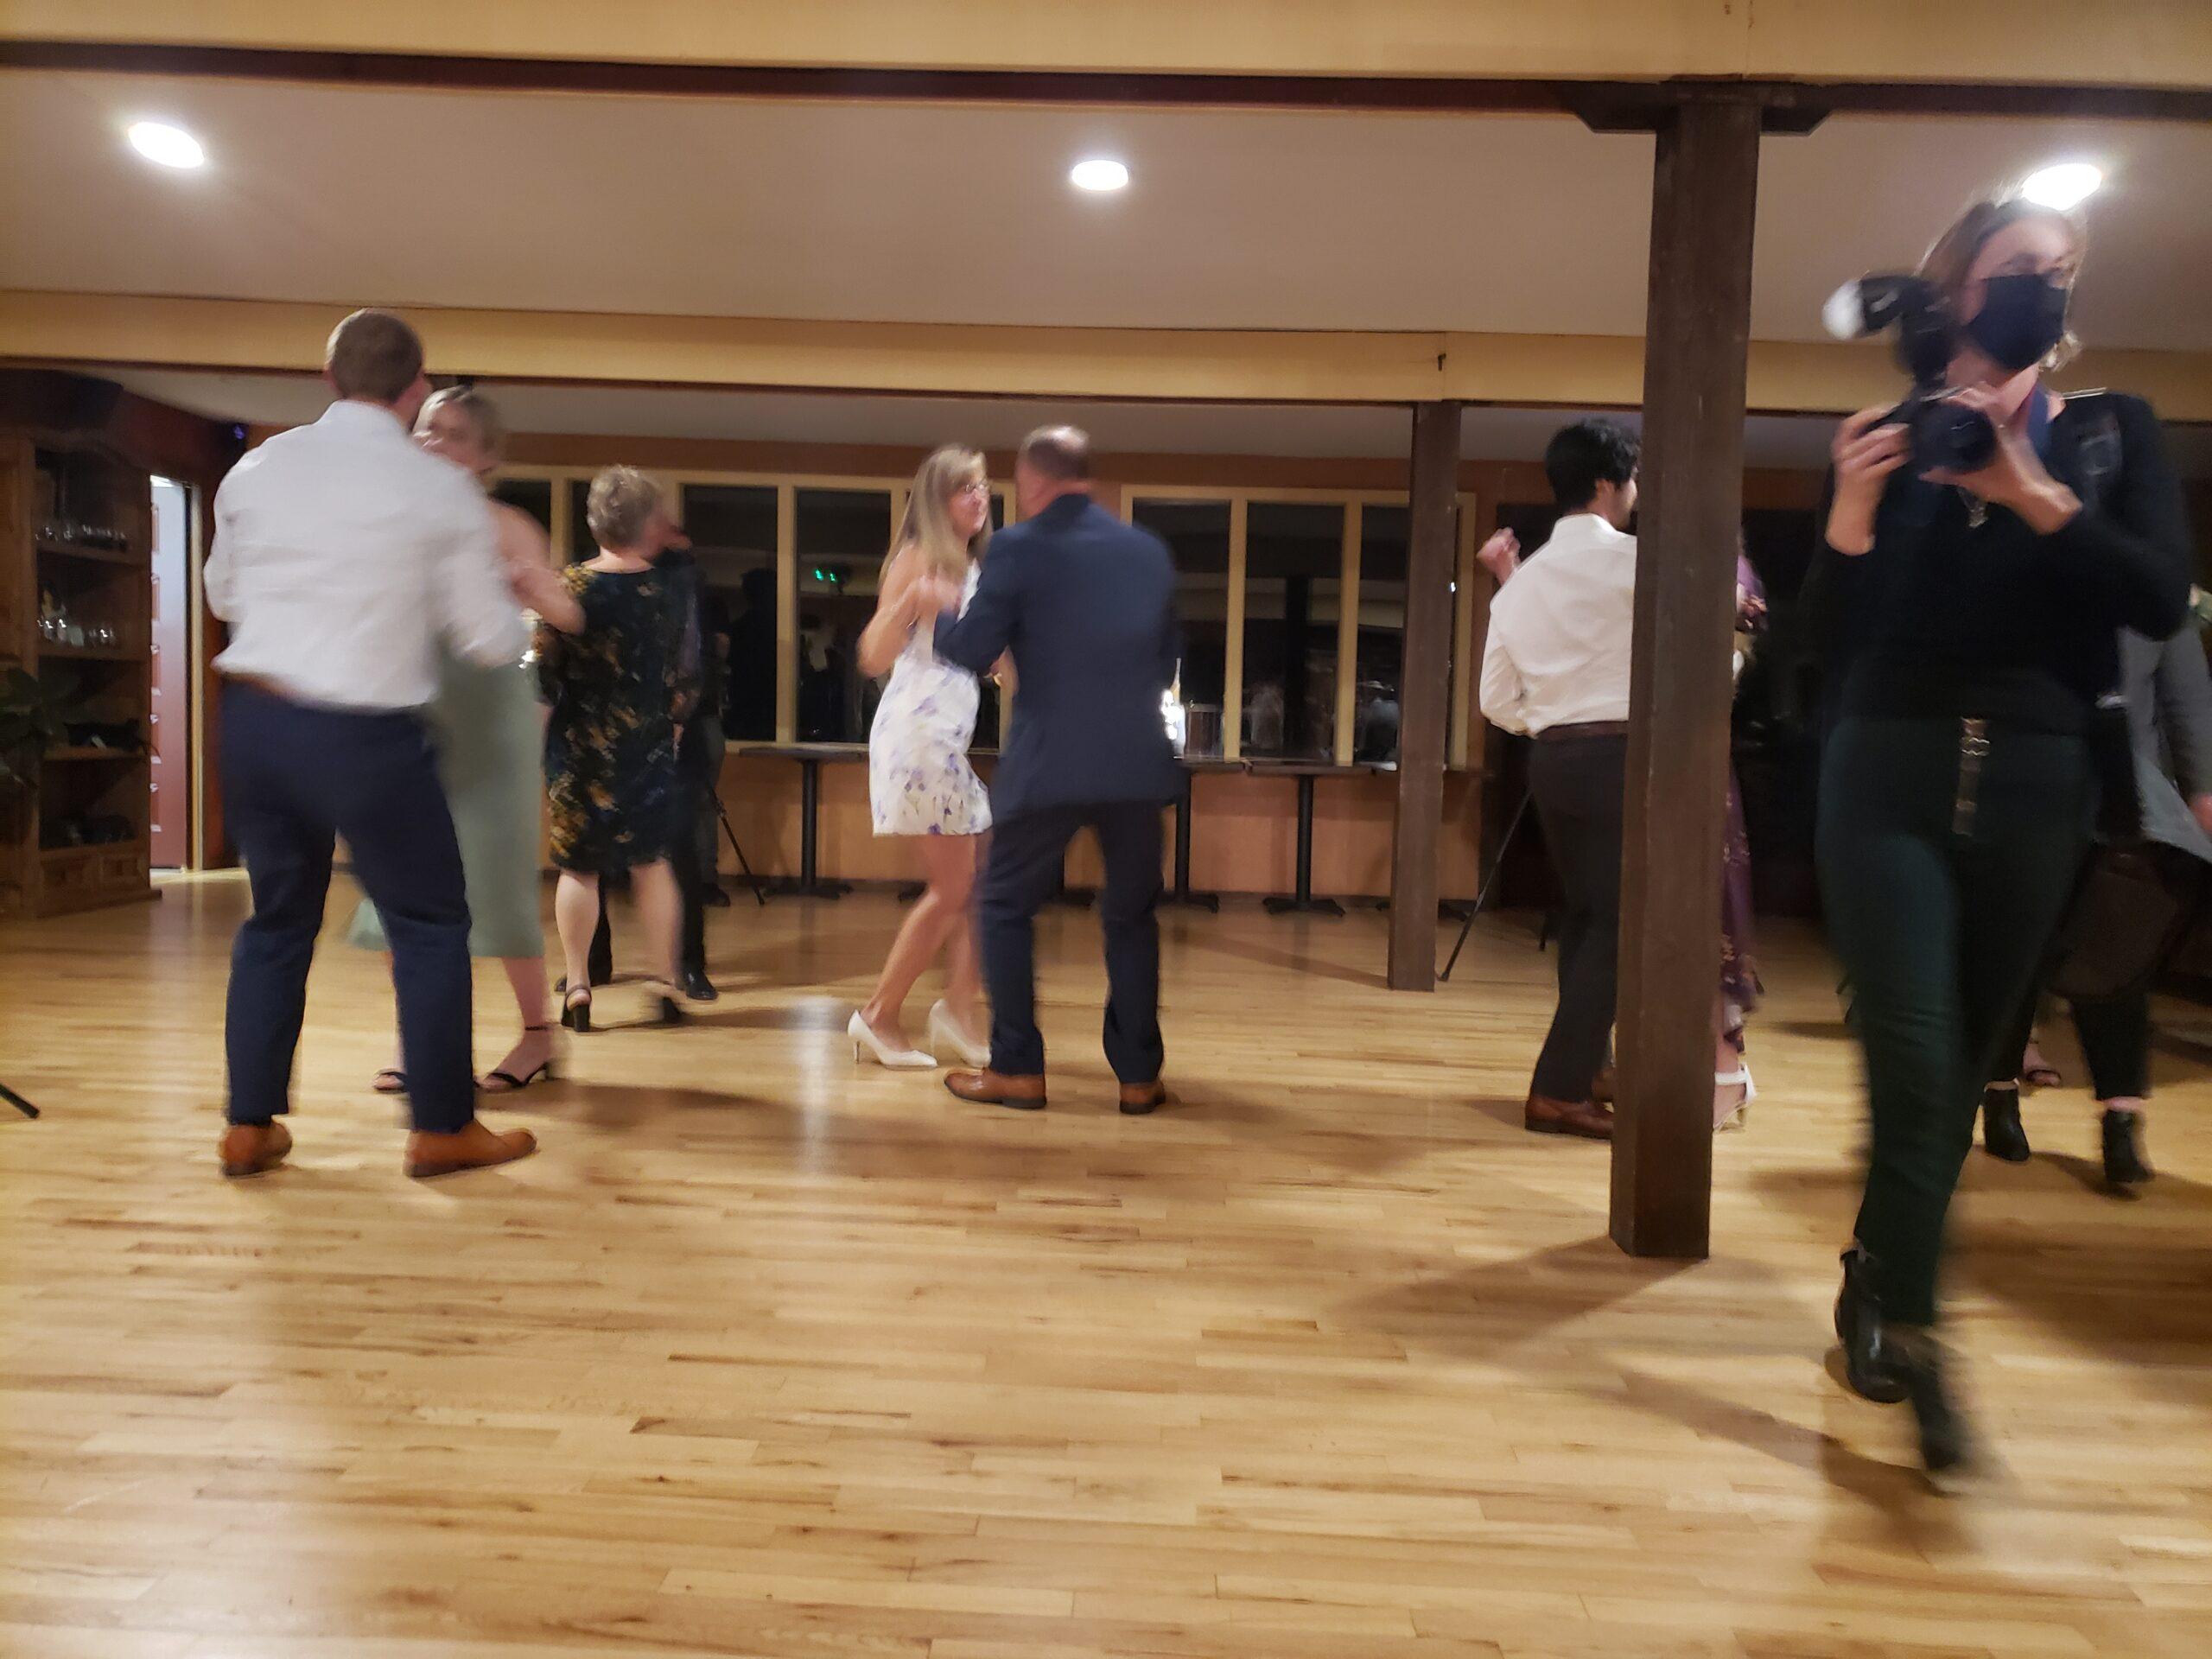 Canby Oregon St Josef Winery Wedding (10-10-2021)